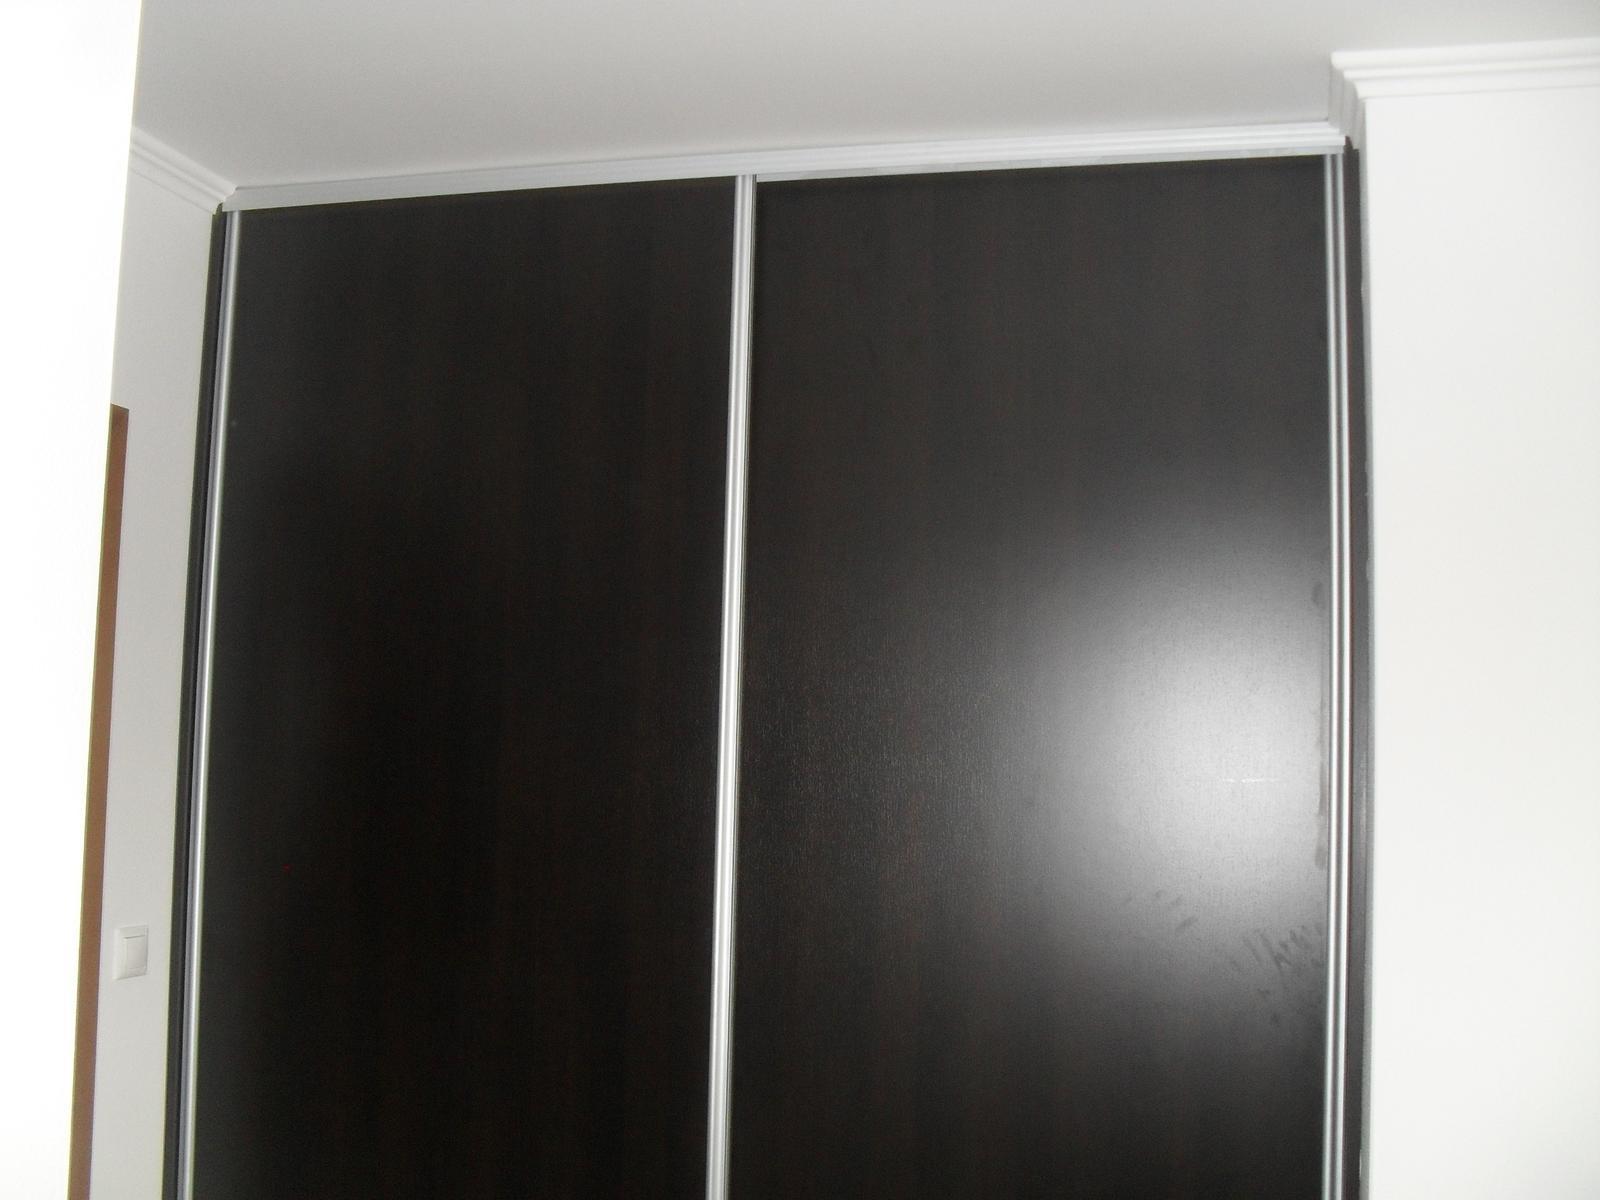 Vstavané skrine Martin Benko Bošany - Obrázok č. 7